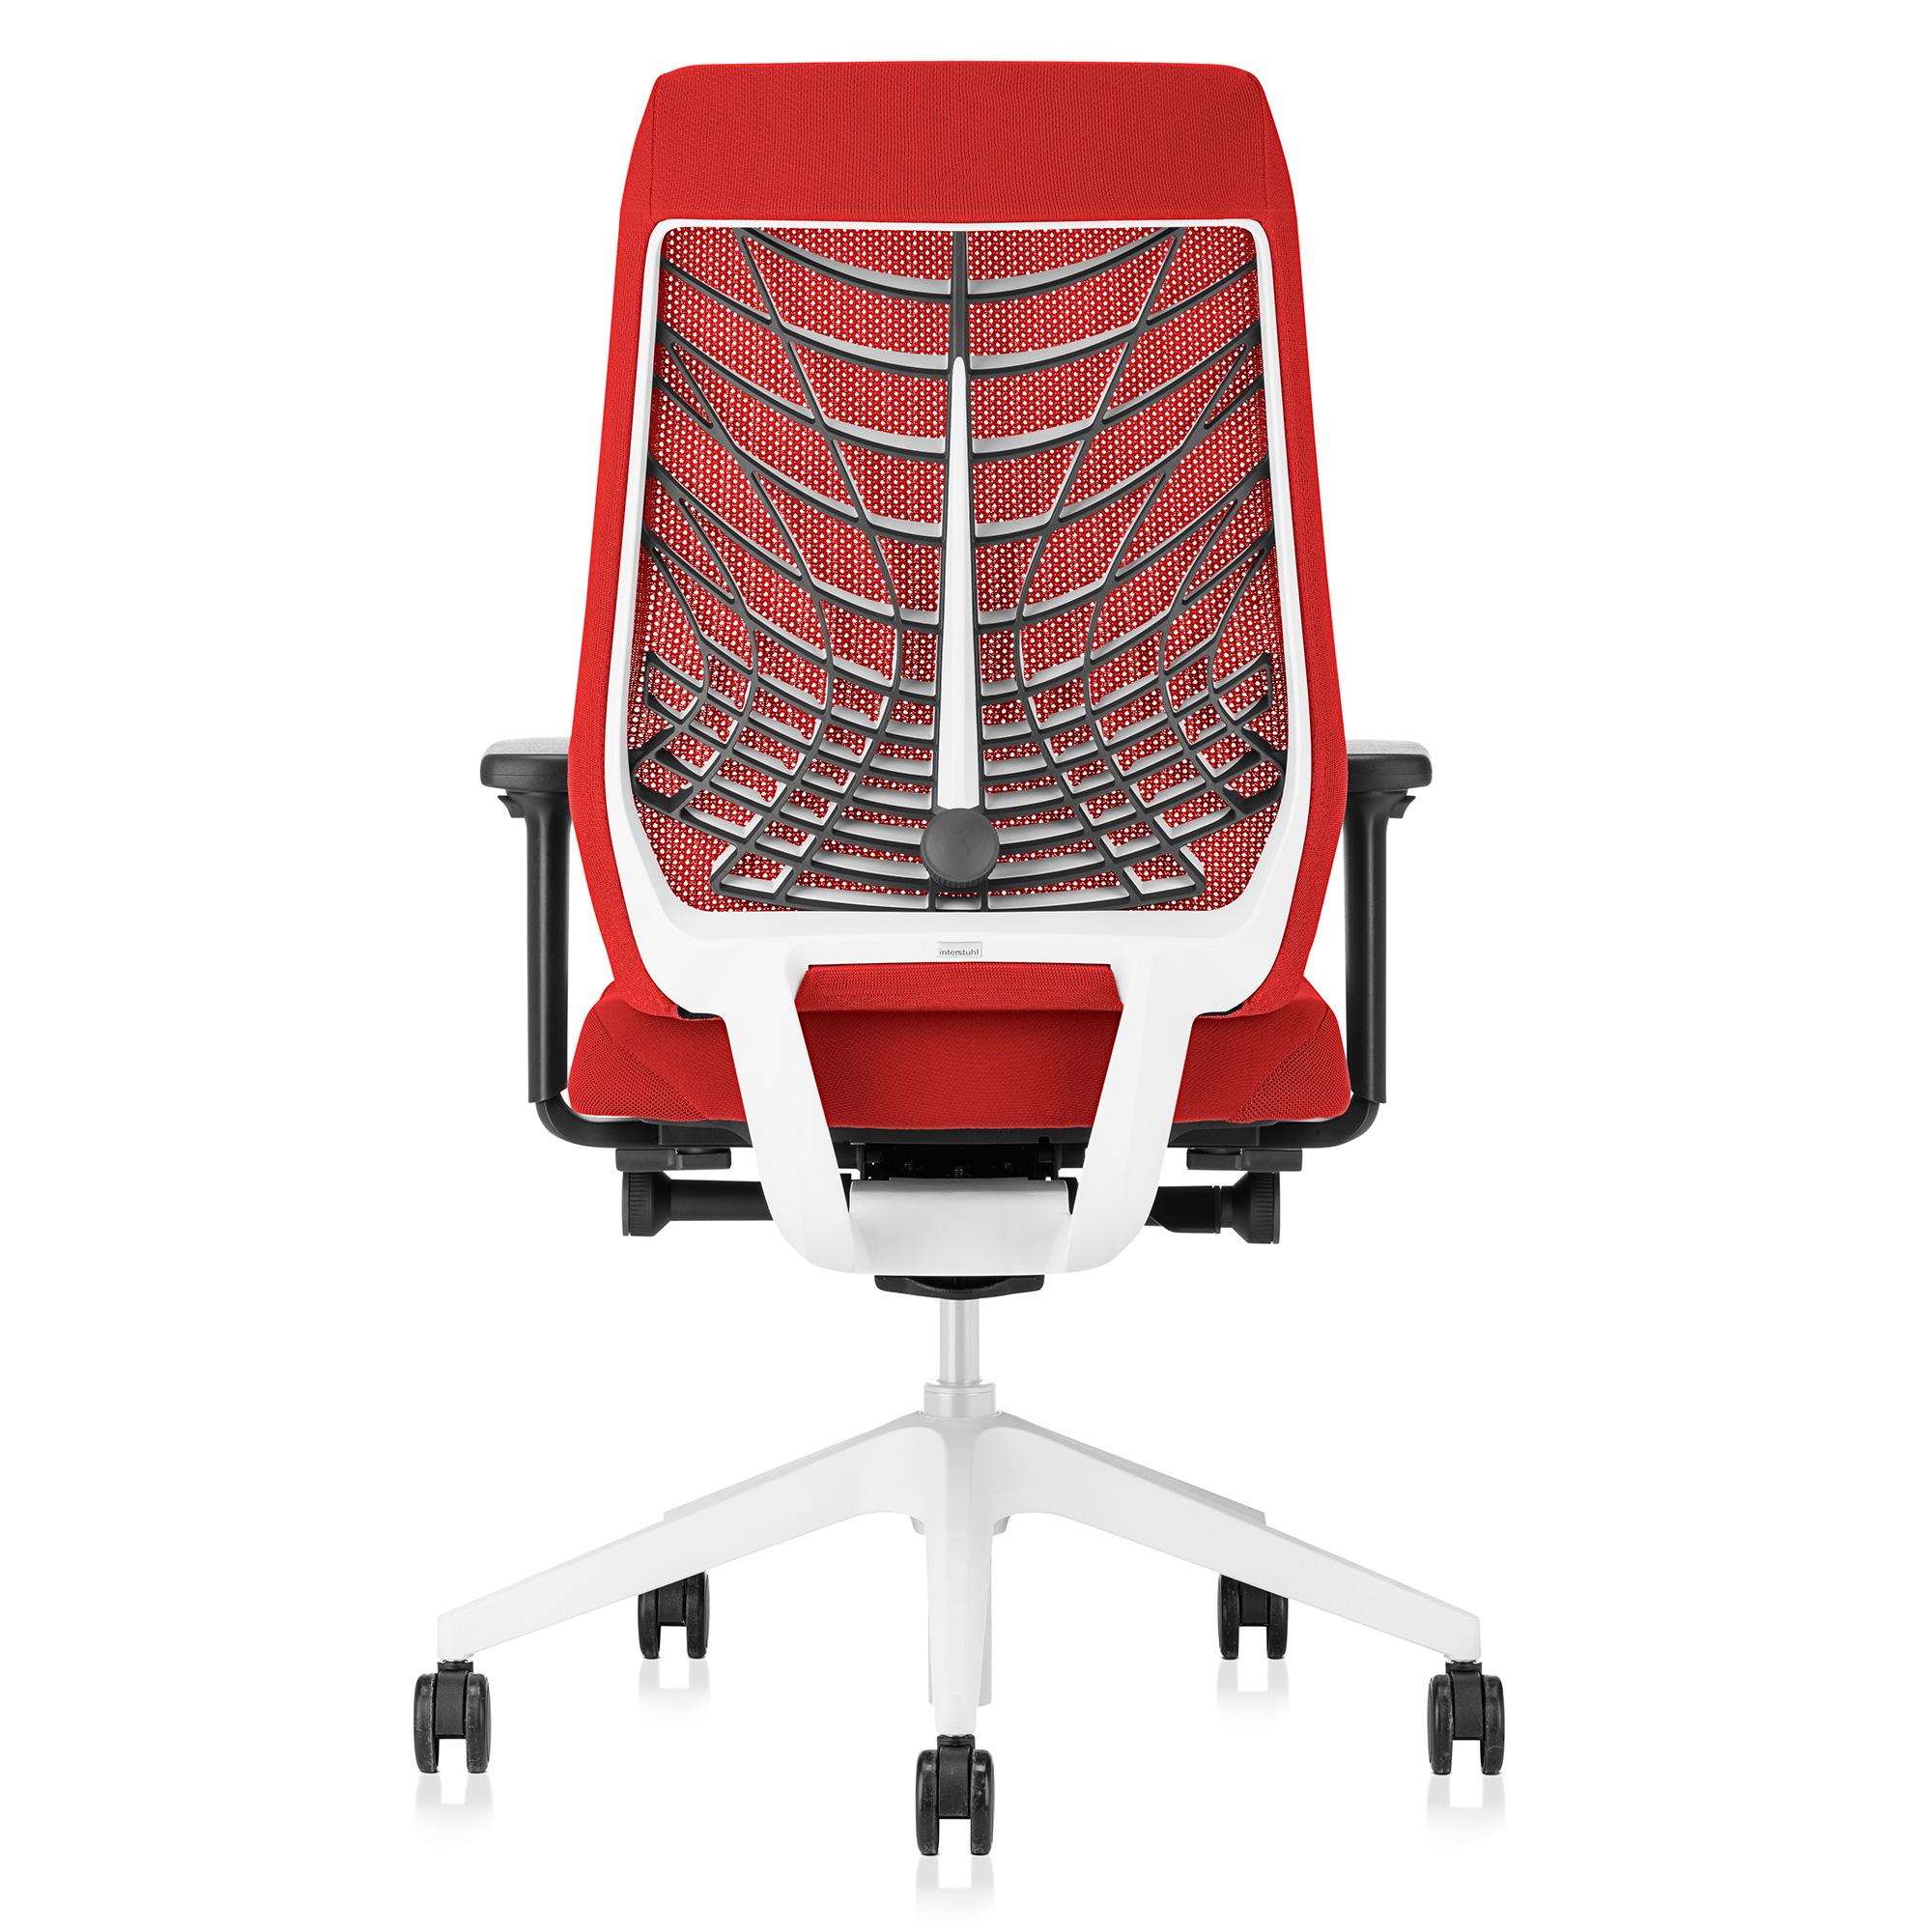 Interstuhl JOYCEis3 JC216 Bürostuhl mit innovativer FlexGrid-Rückenlehne